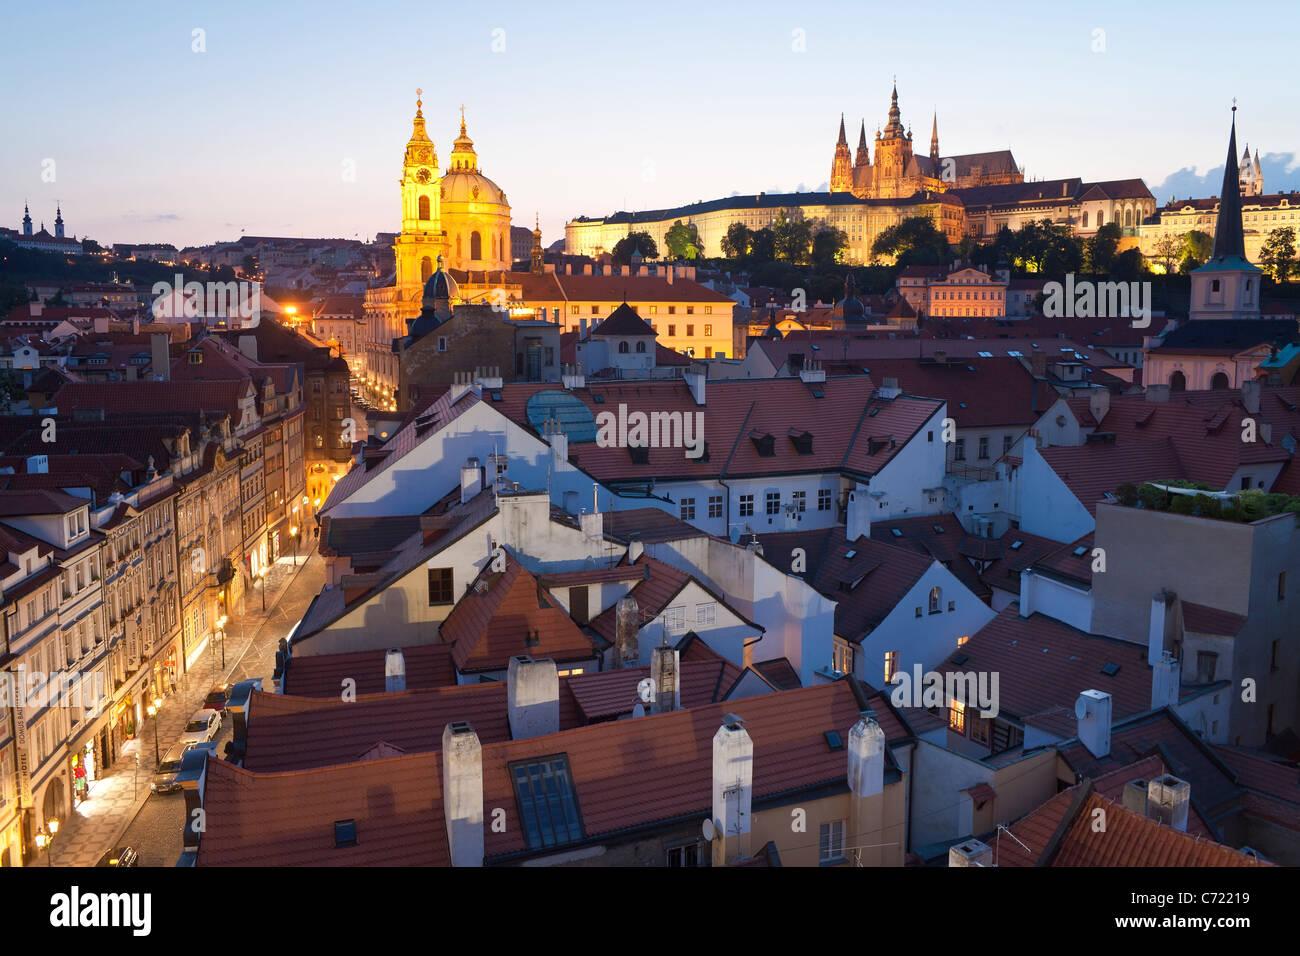 St Vitus cathedral and St Nicholas church, Prague, Czech Republic - Stock Image